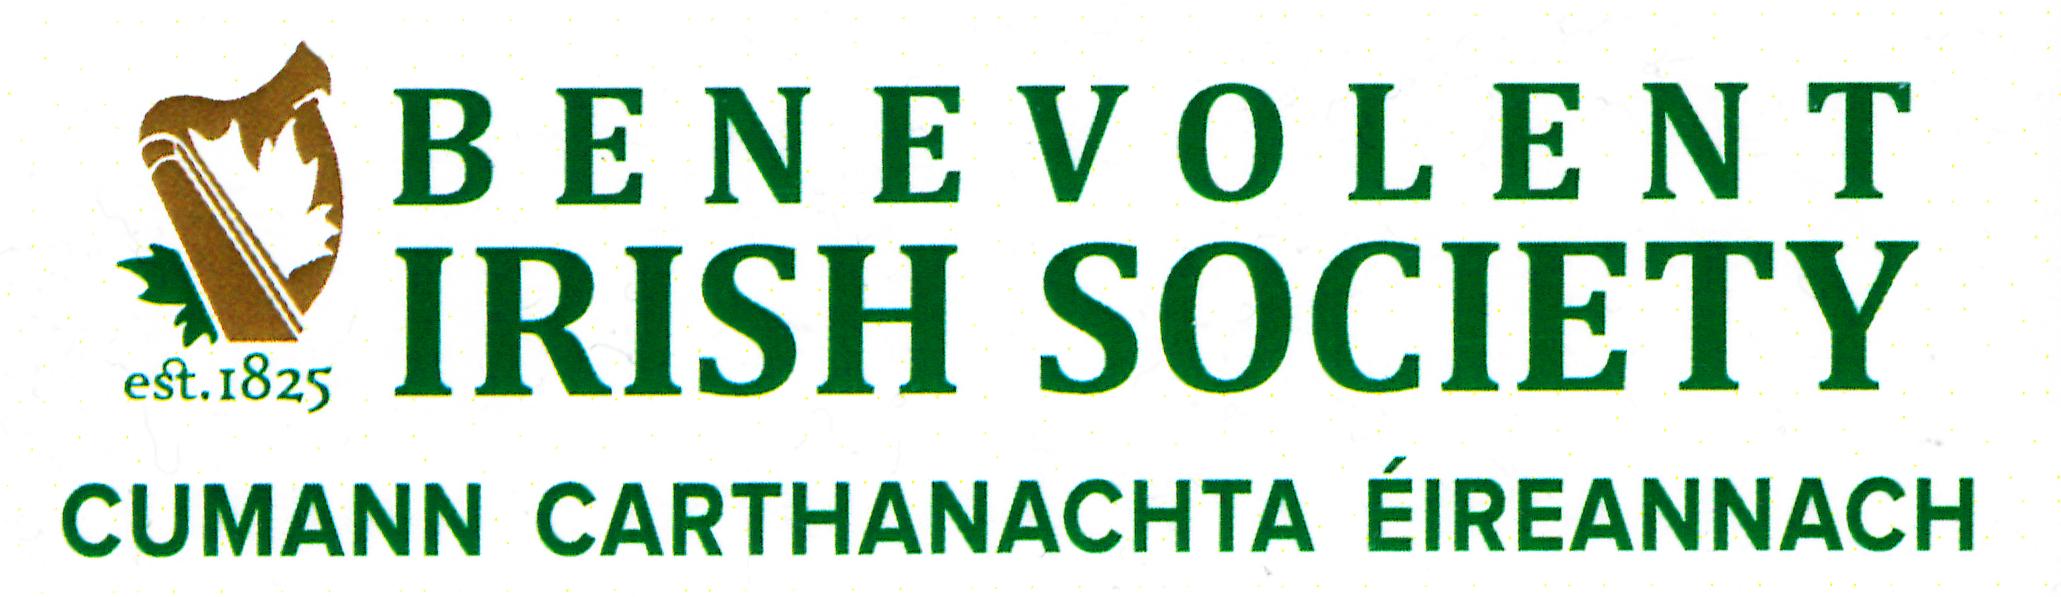 Benevolent Irish Society Audio Collection